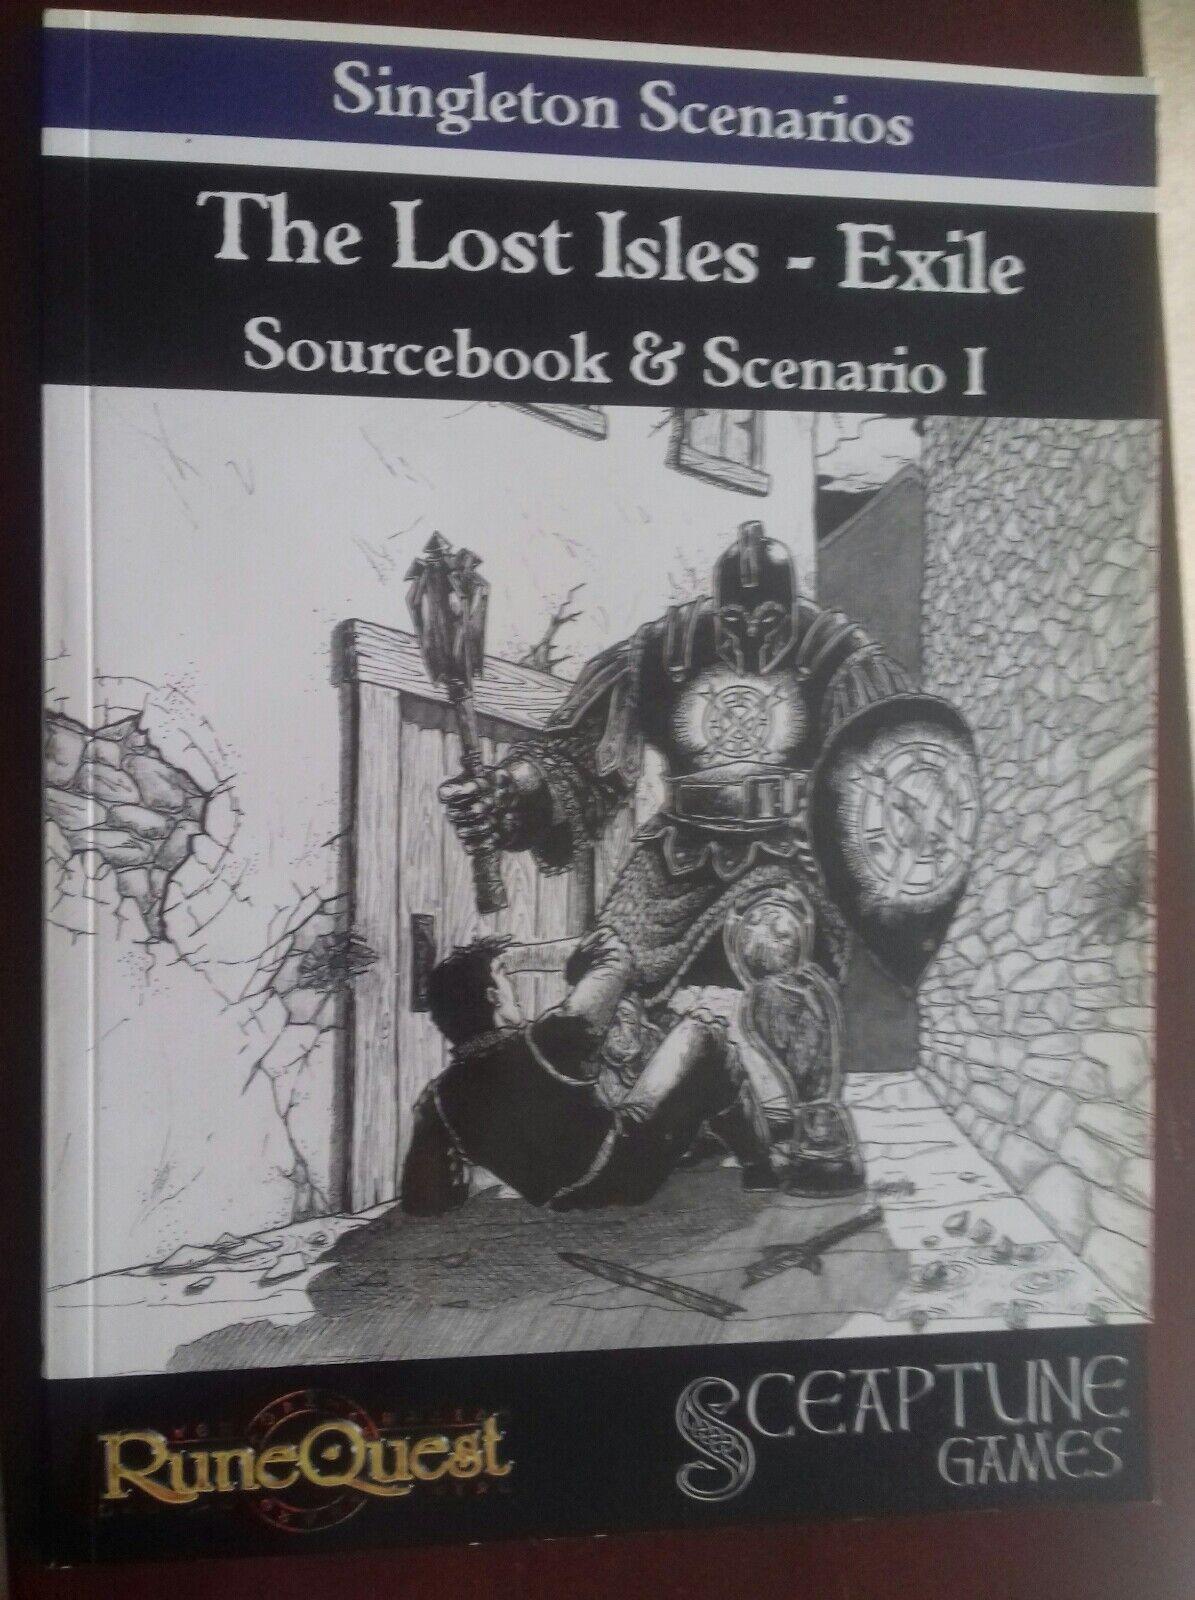 Lost isles exile runequest singleton scenario & sourcebook sceaptune games book